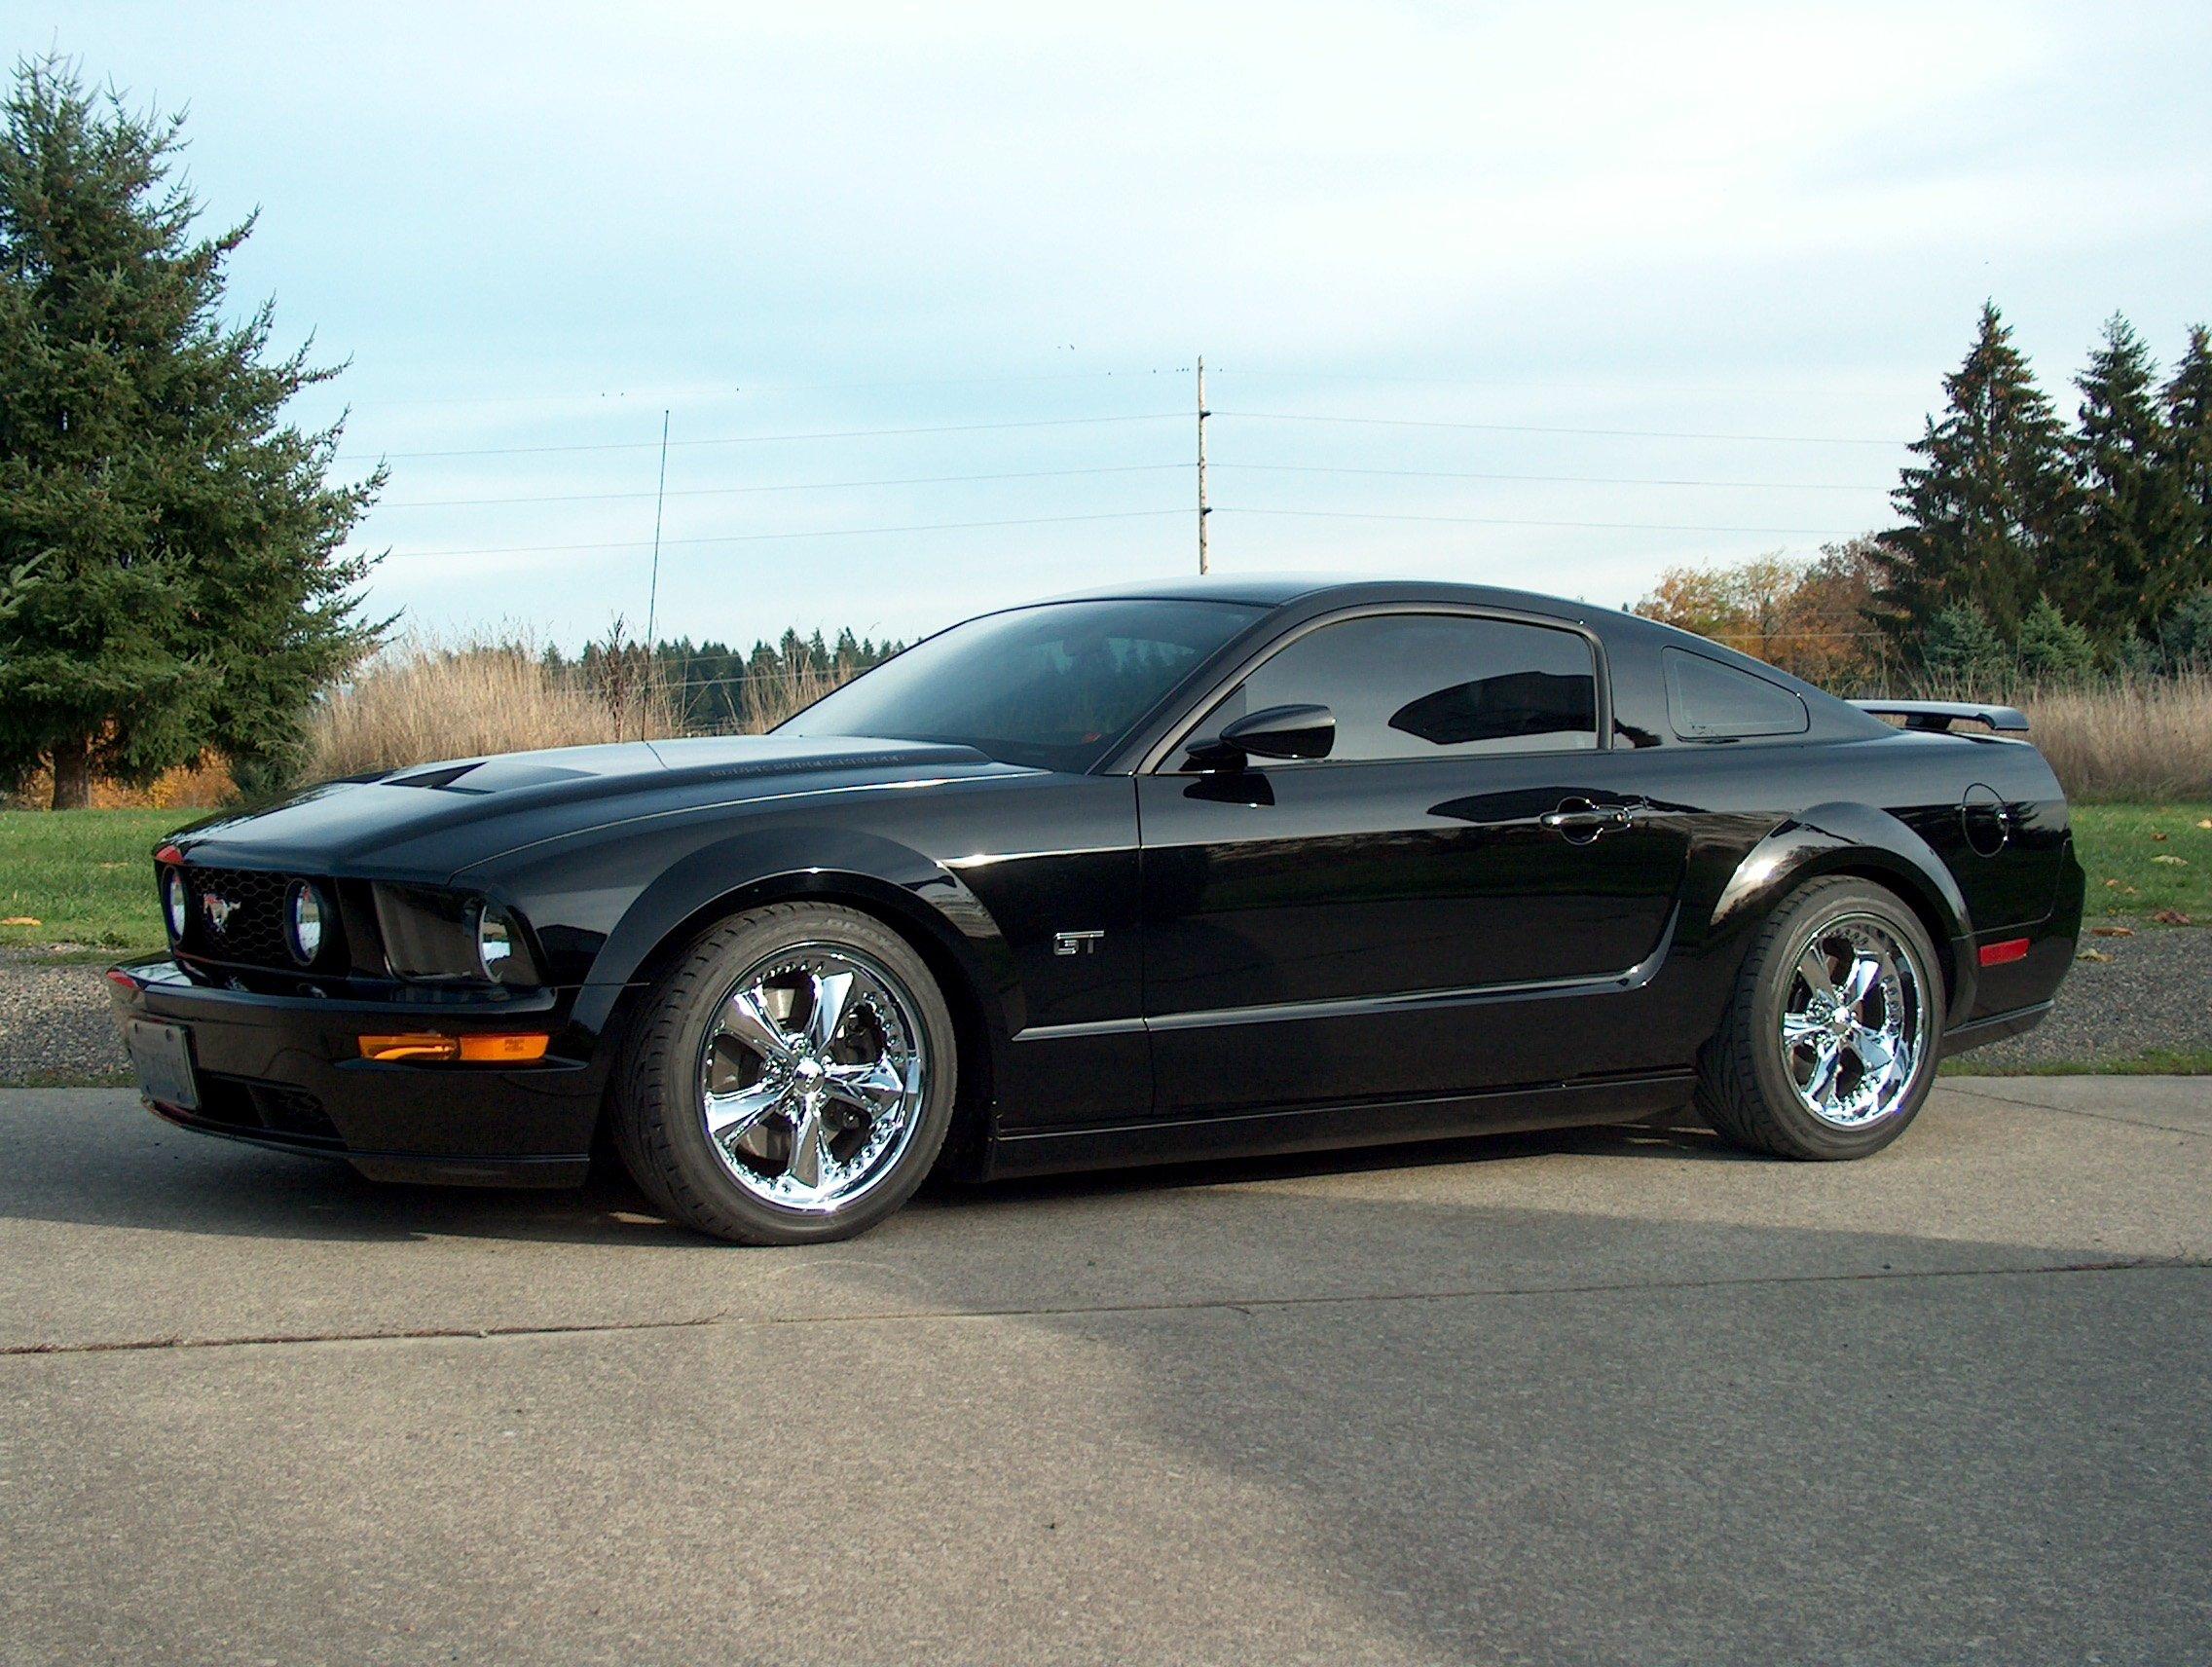 Black Stang Ford Mustang Forum - 2007 mustang